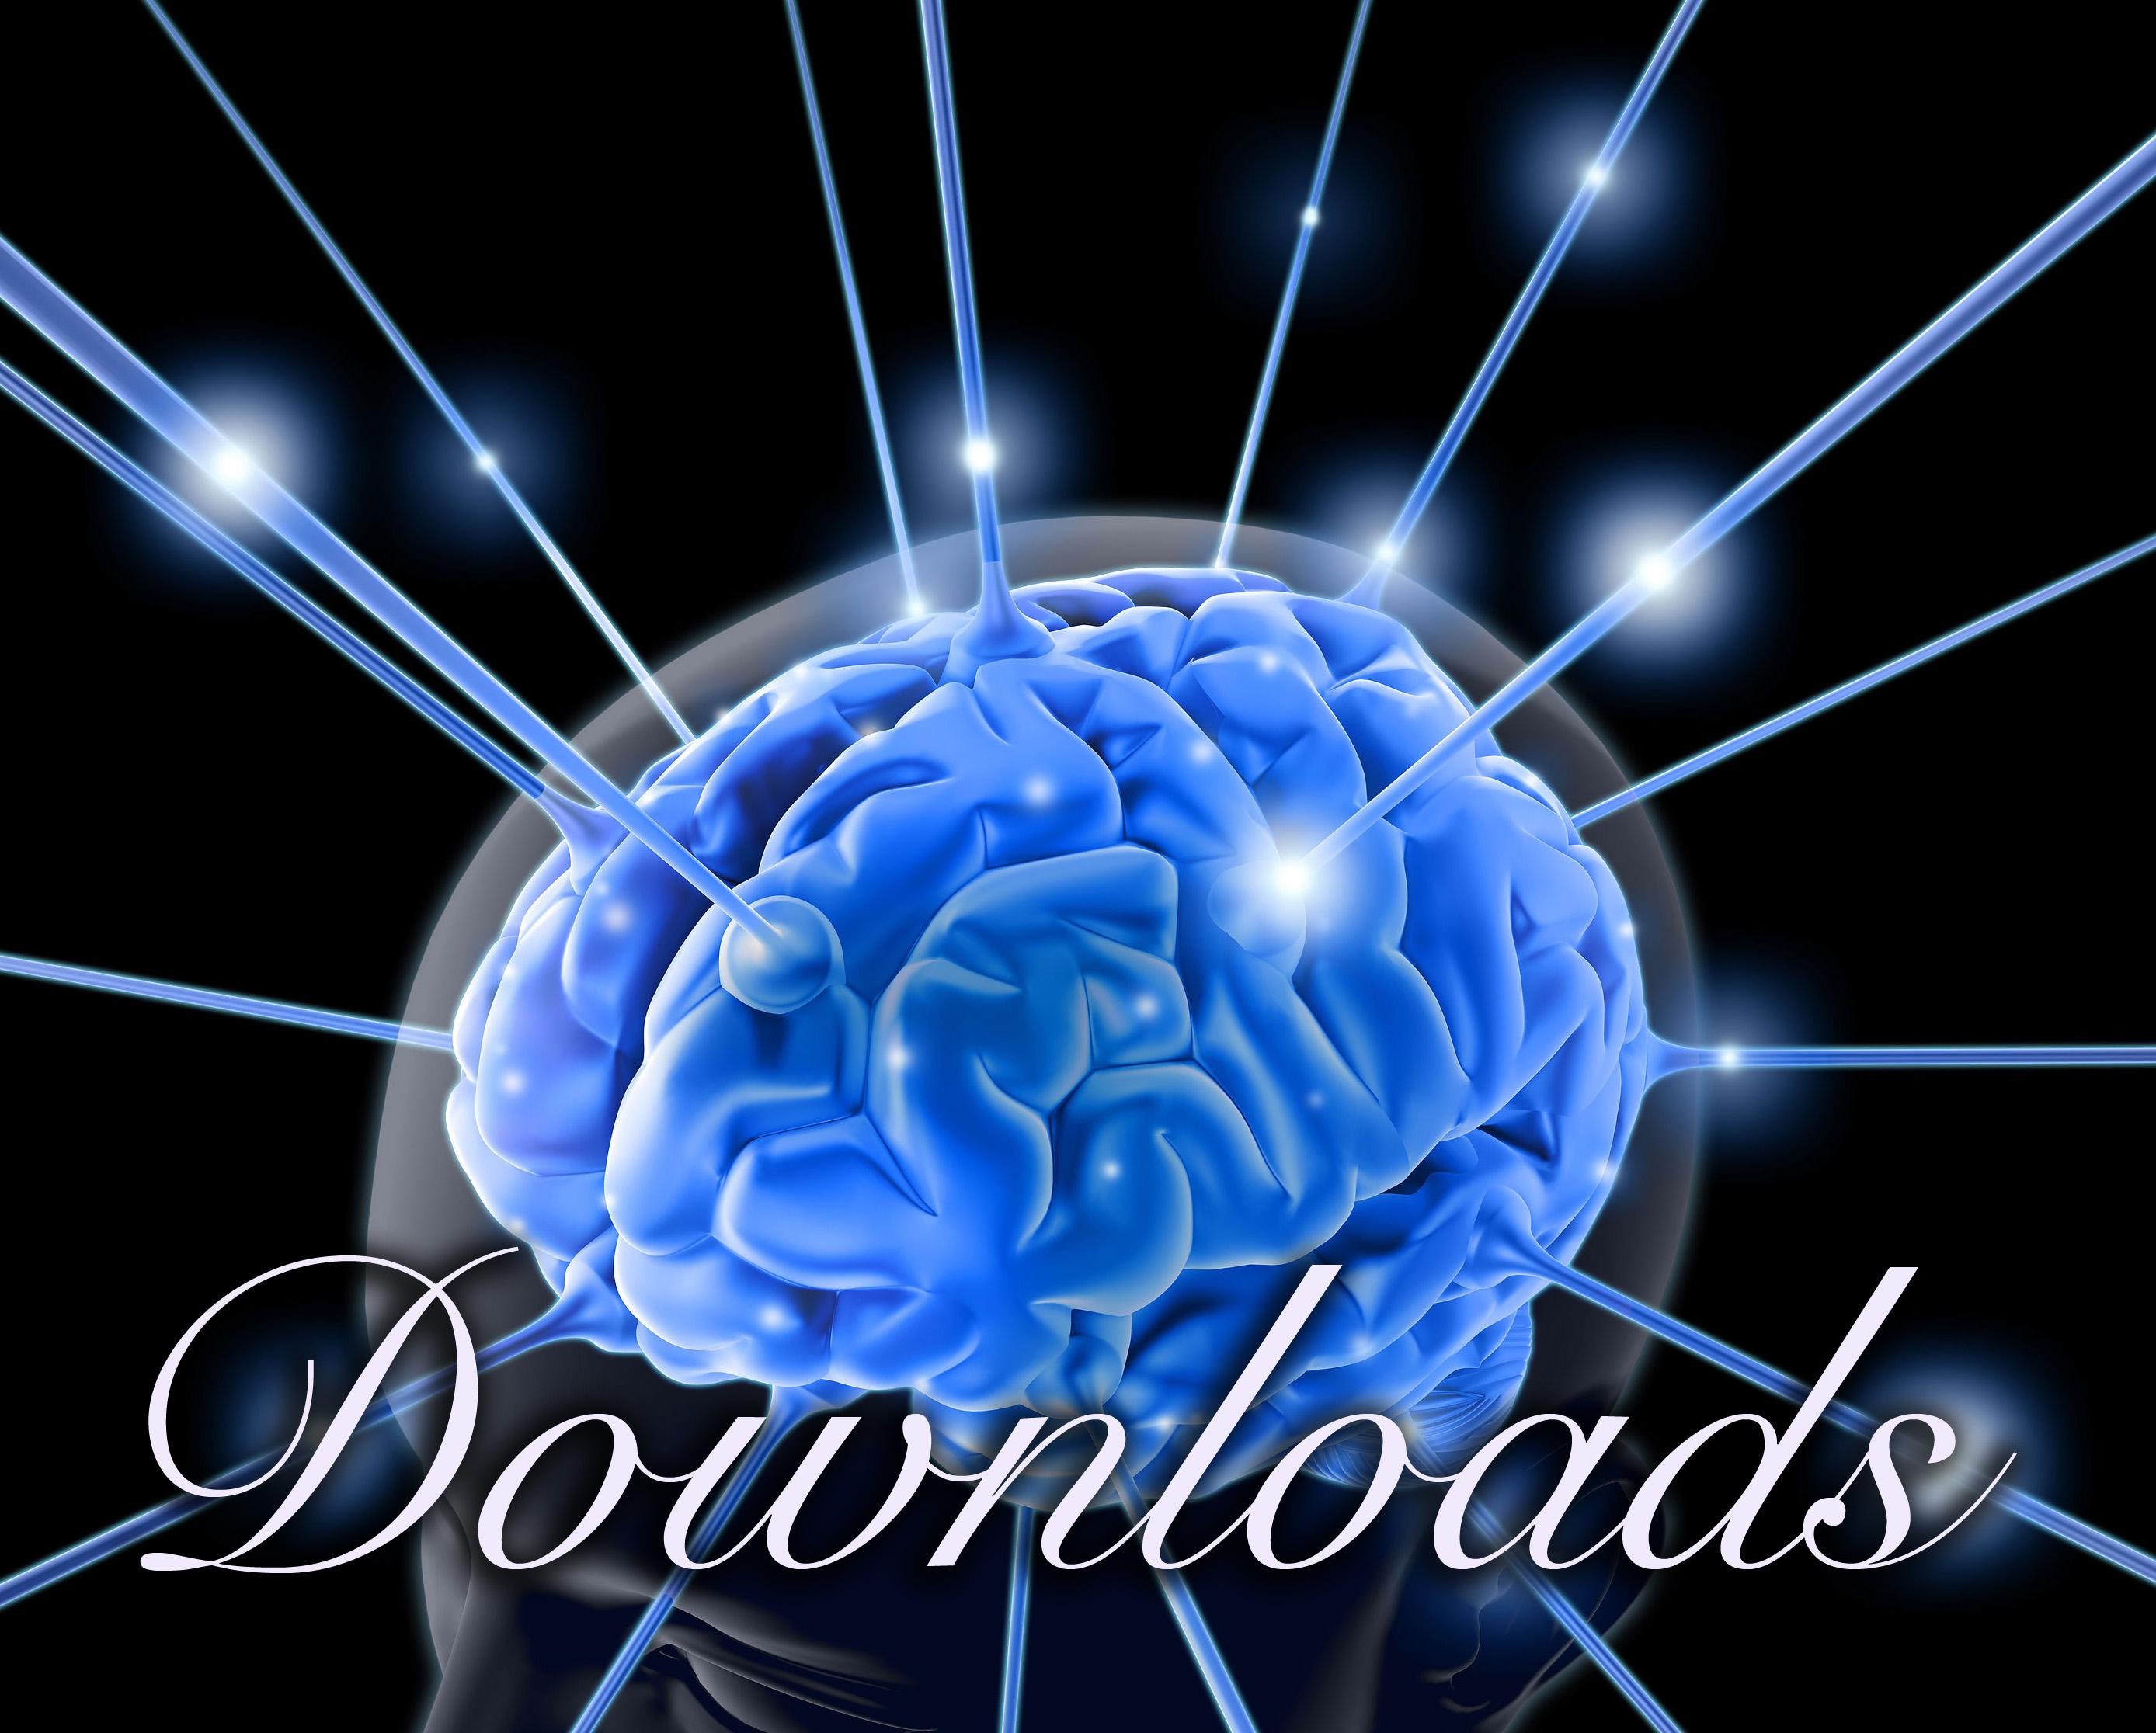 downloadsimage